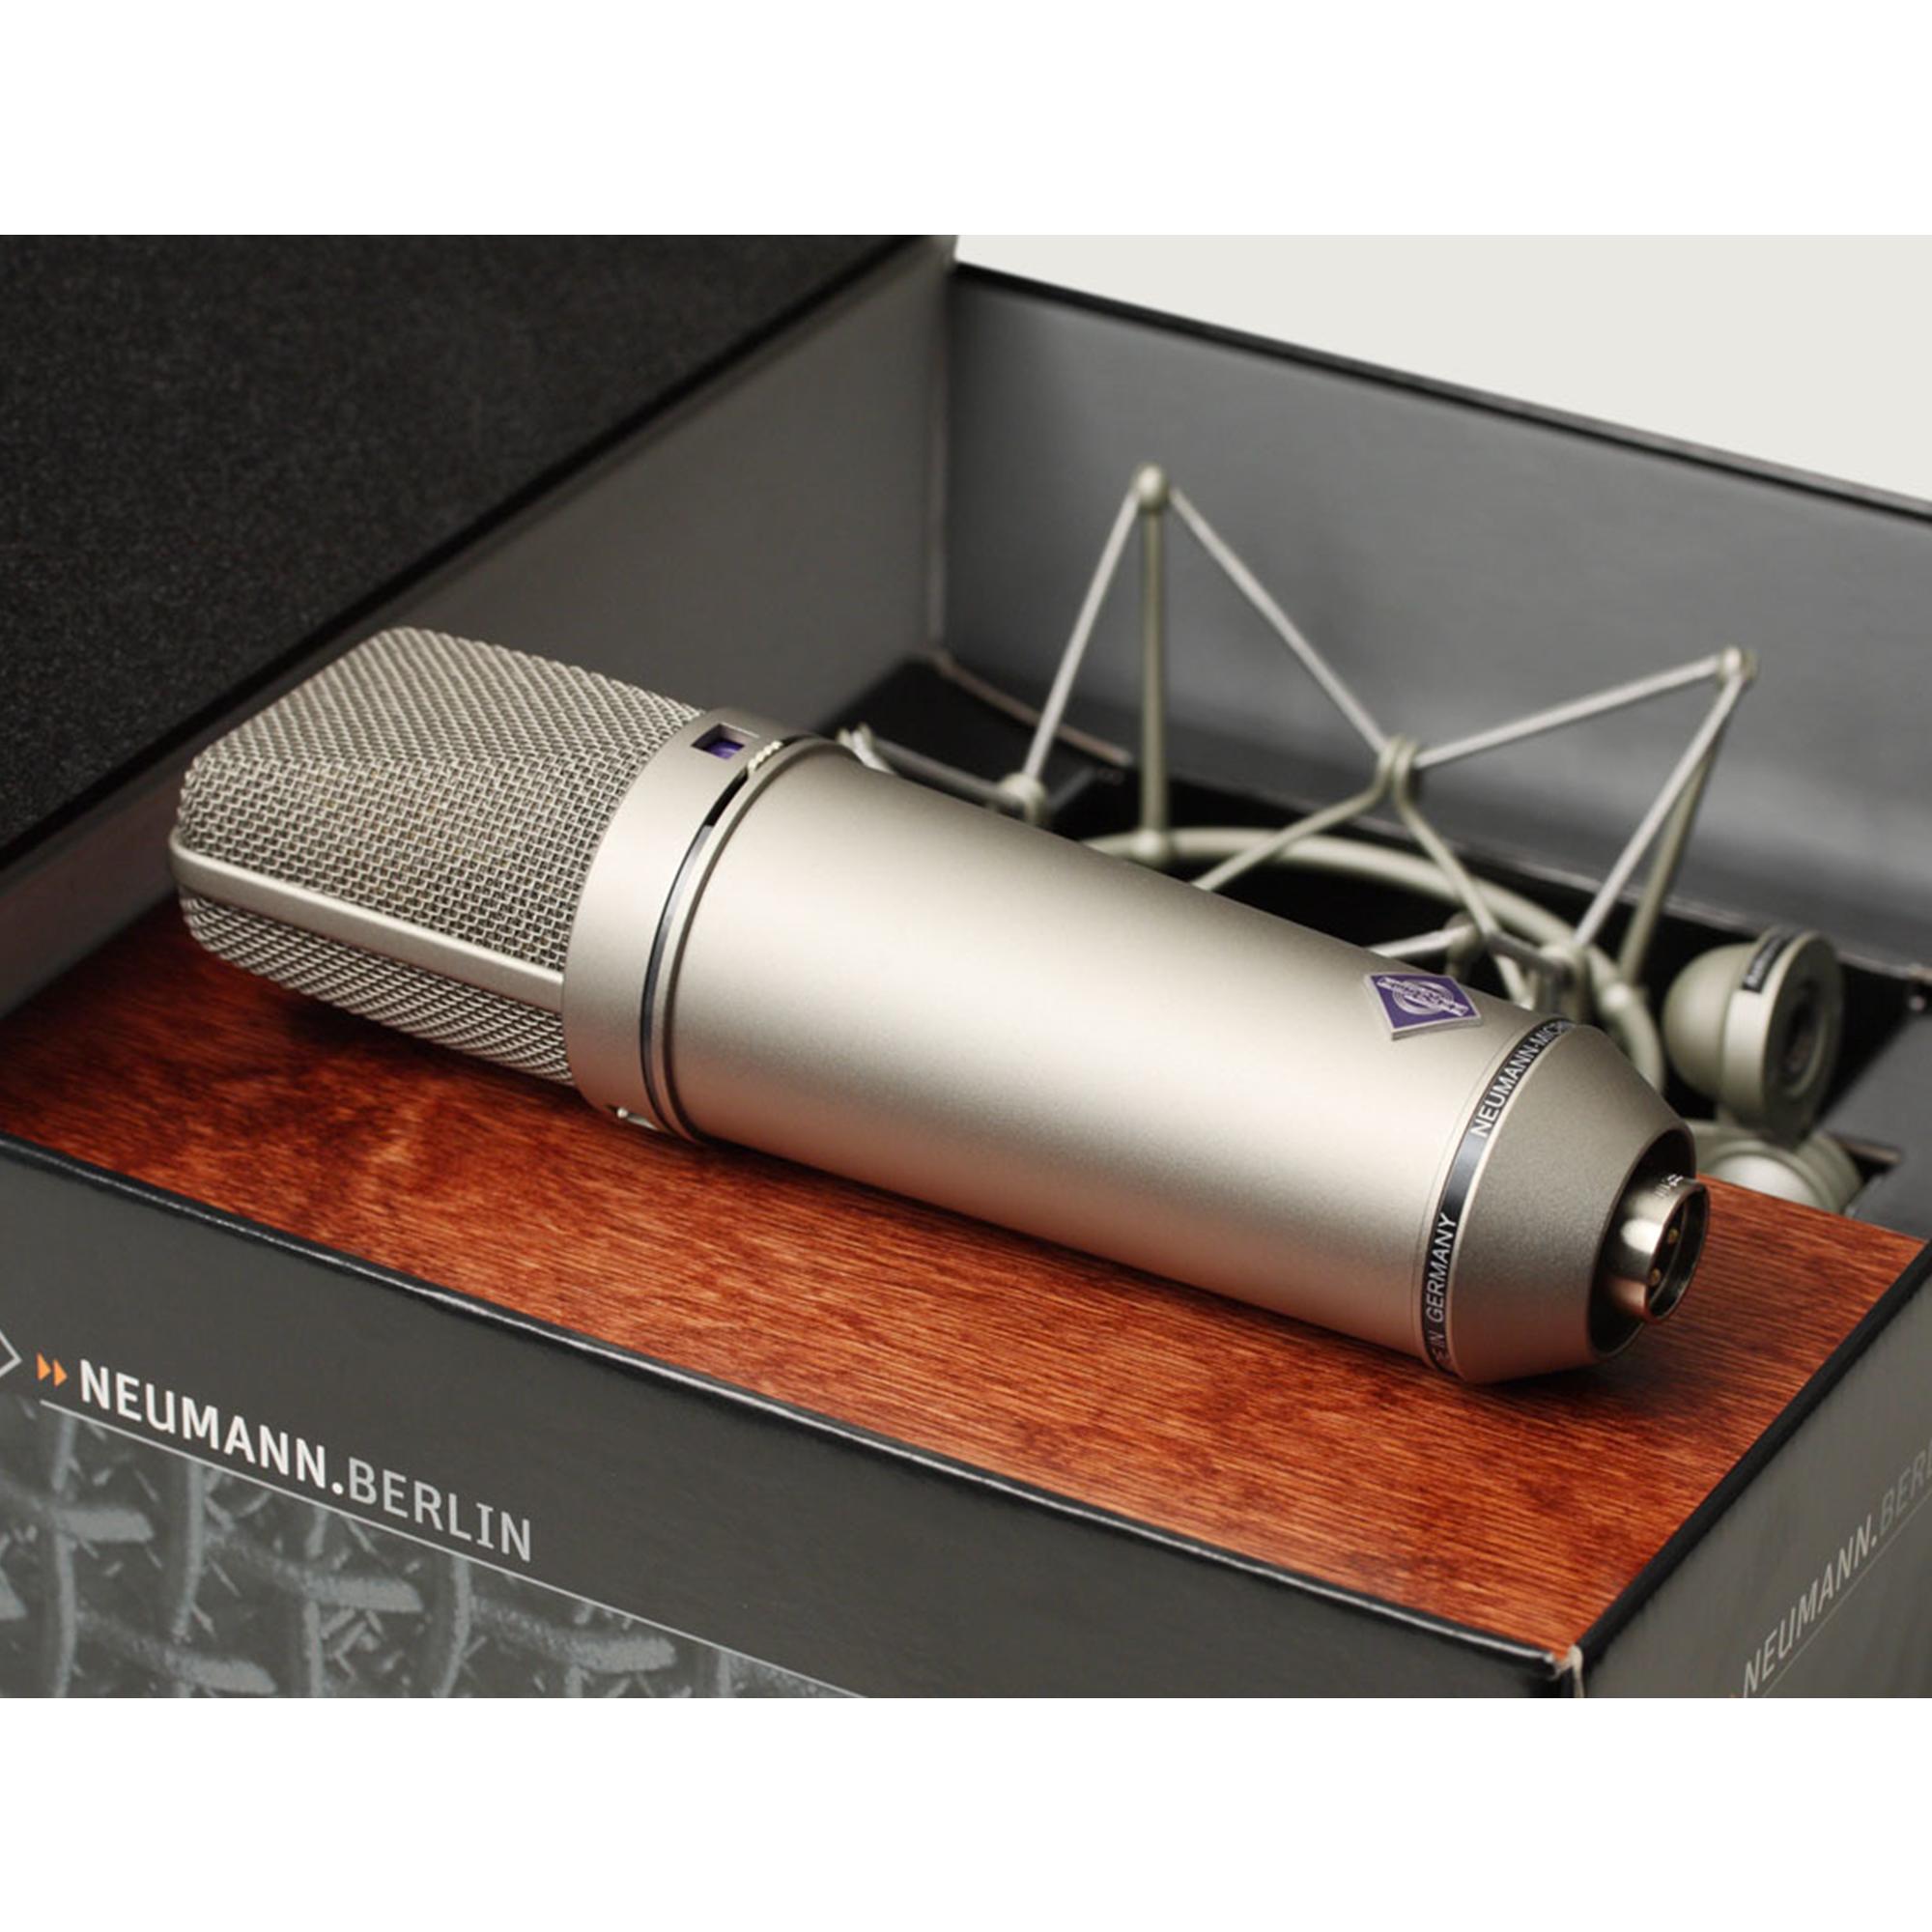 777p 0000 order supplement image zoom in u 87 ai studio set packaging neumann studio microphone p